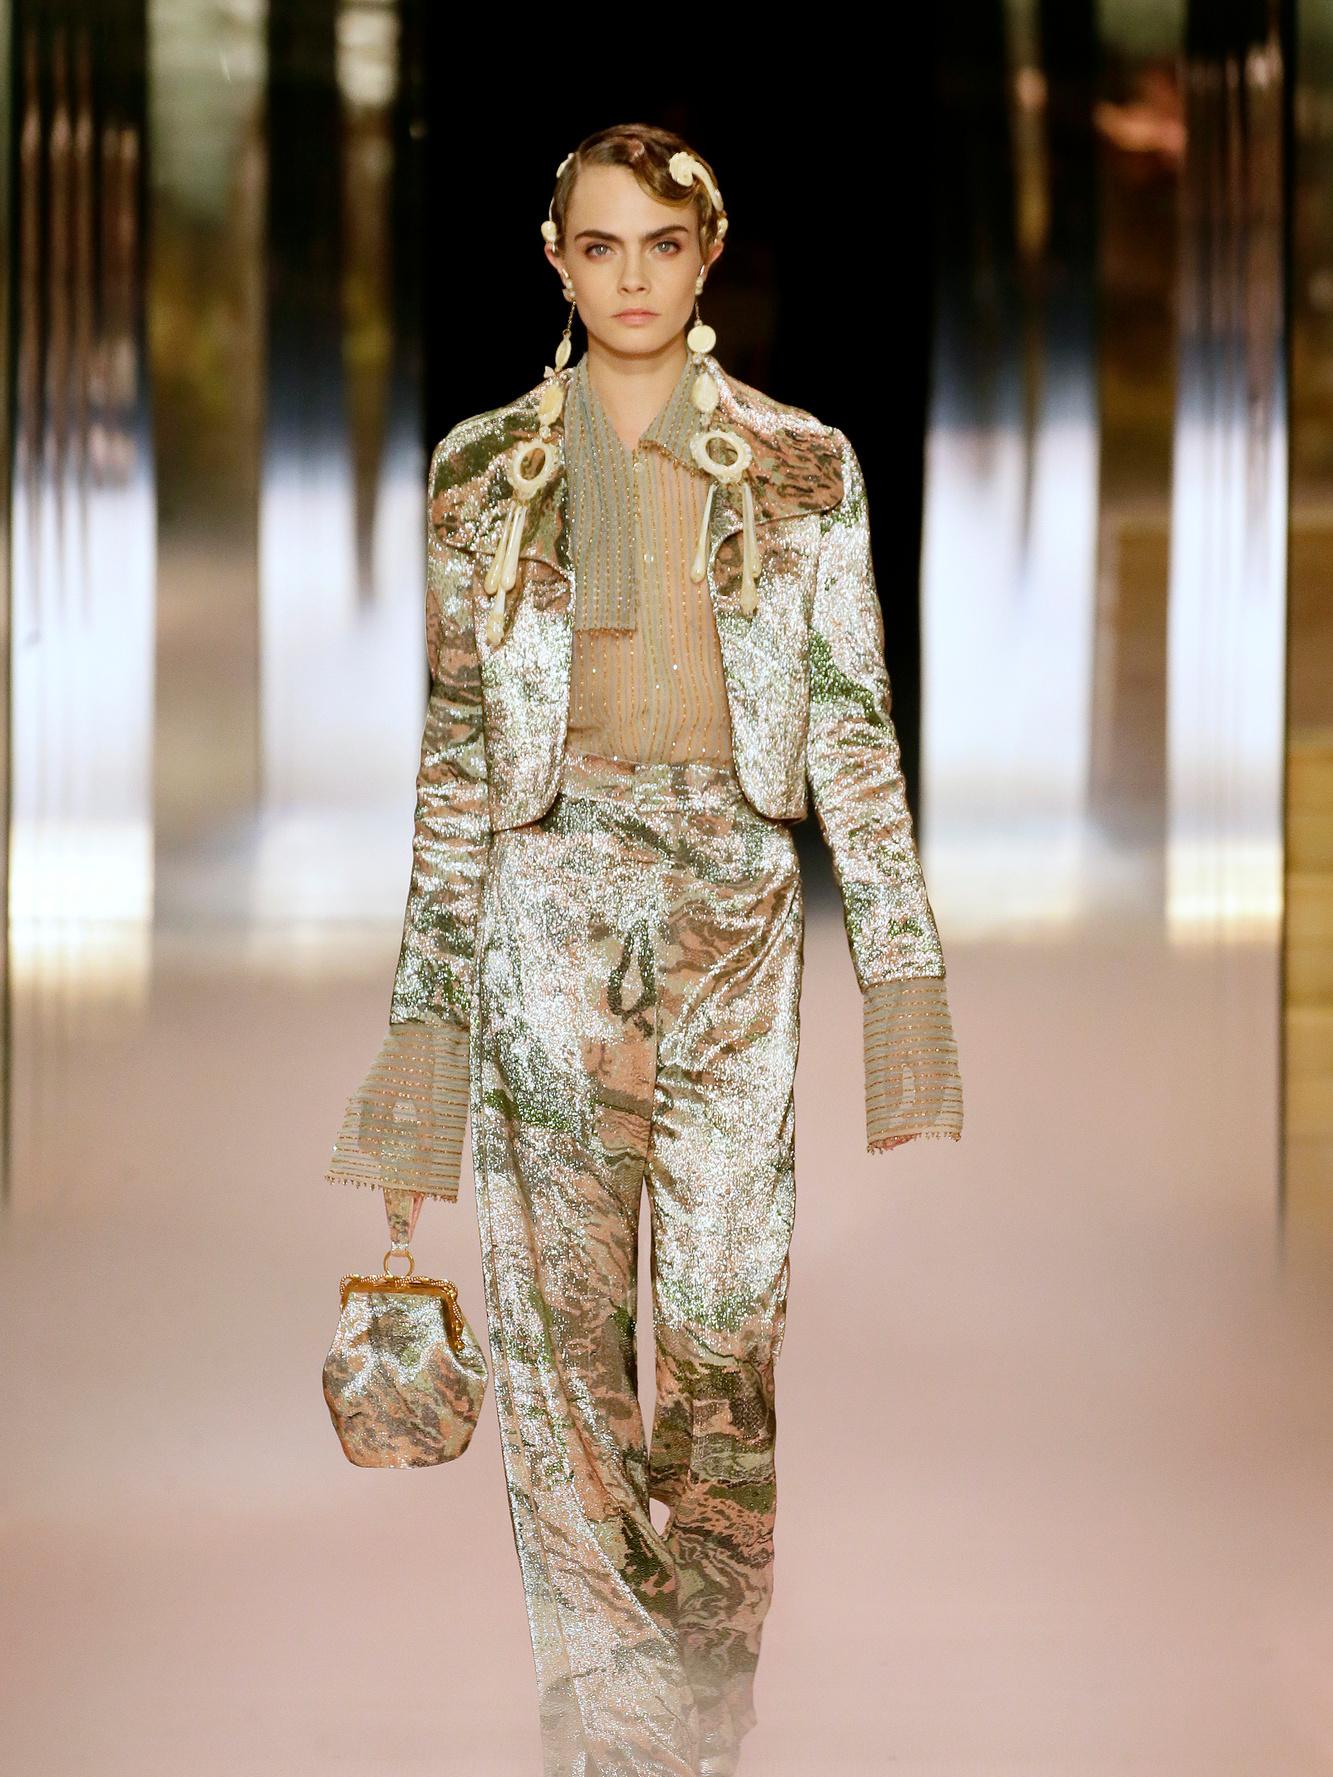 Fendi haute couture SS21, Imaxtree